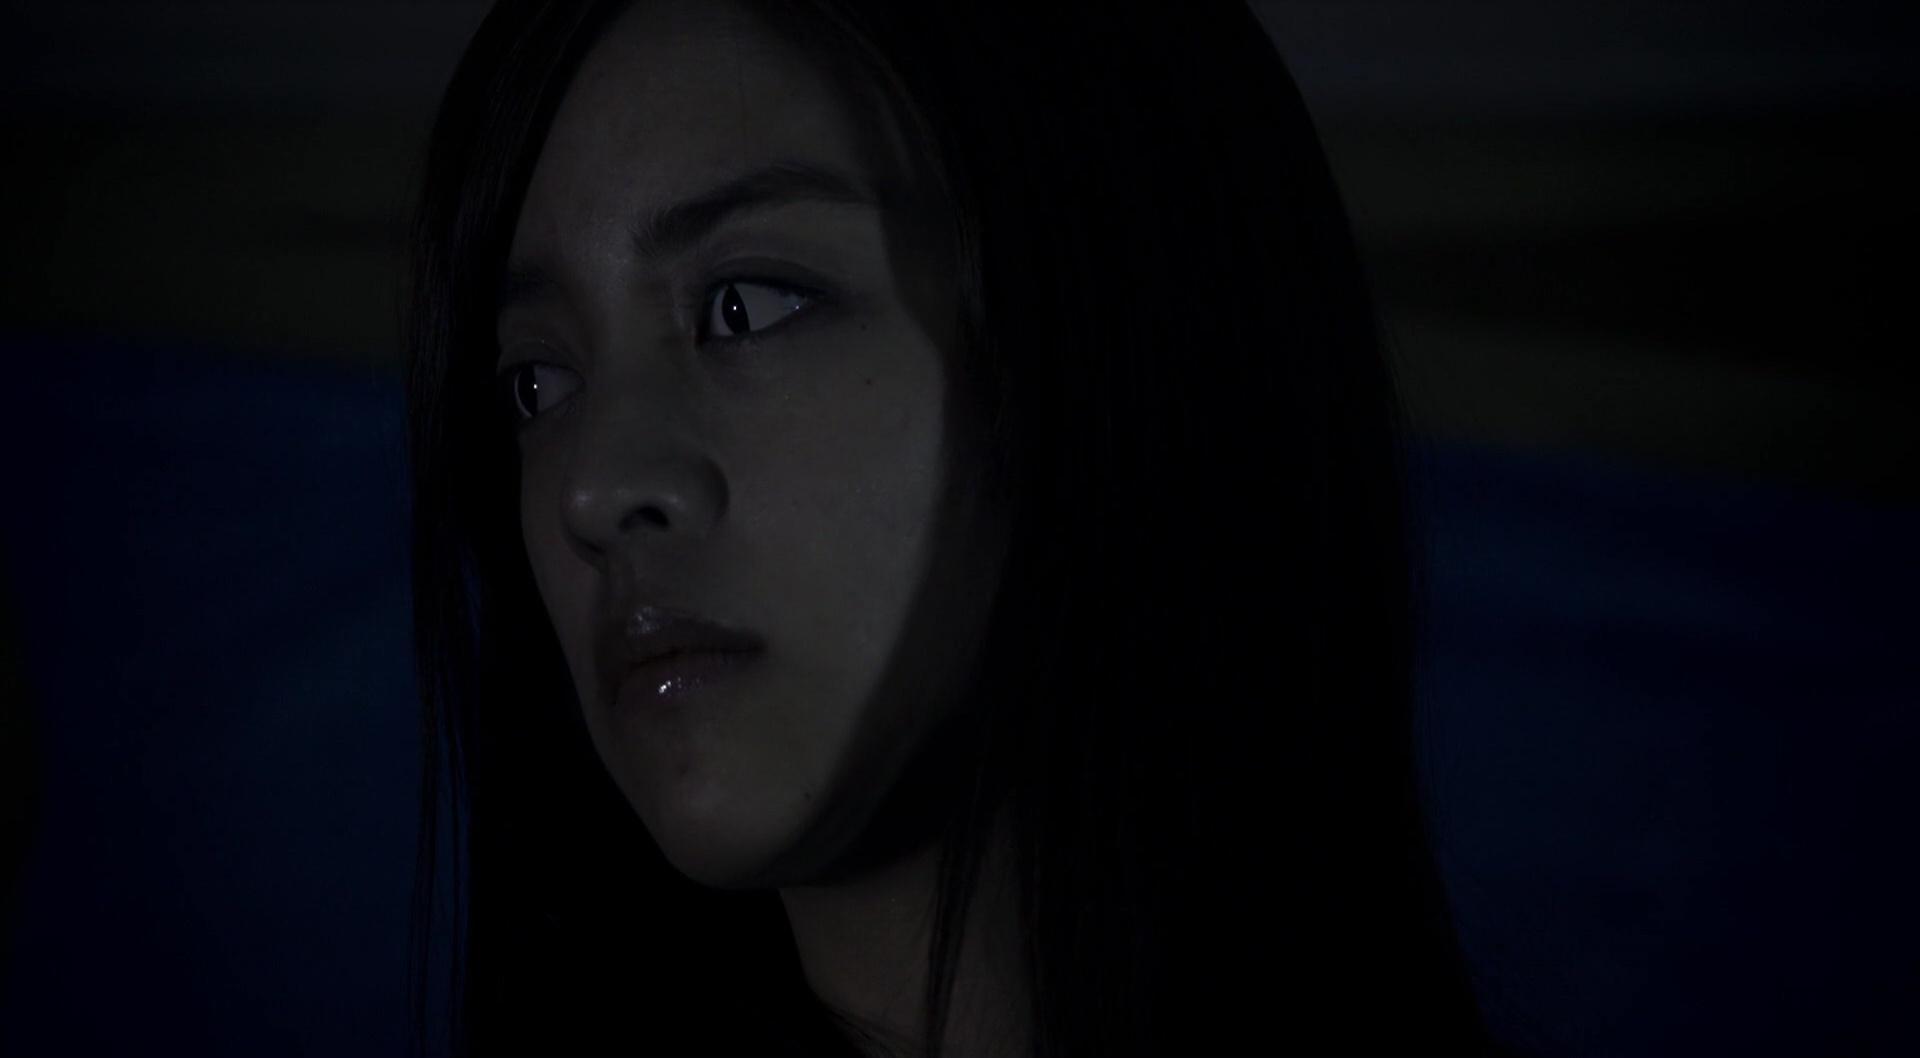 SCREAMING CLASS (絶叫学級) de Sato Tetsuya (2013)